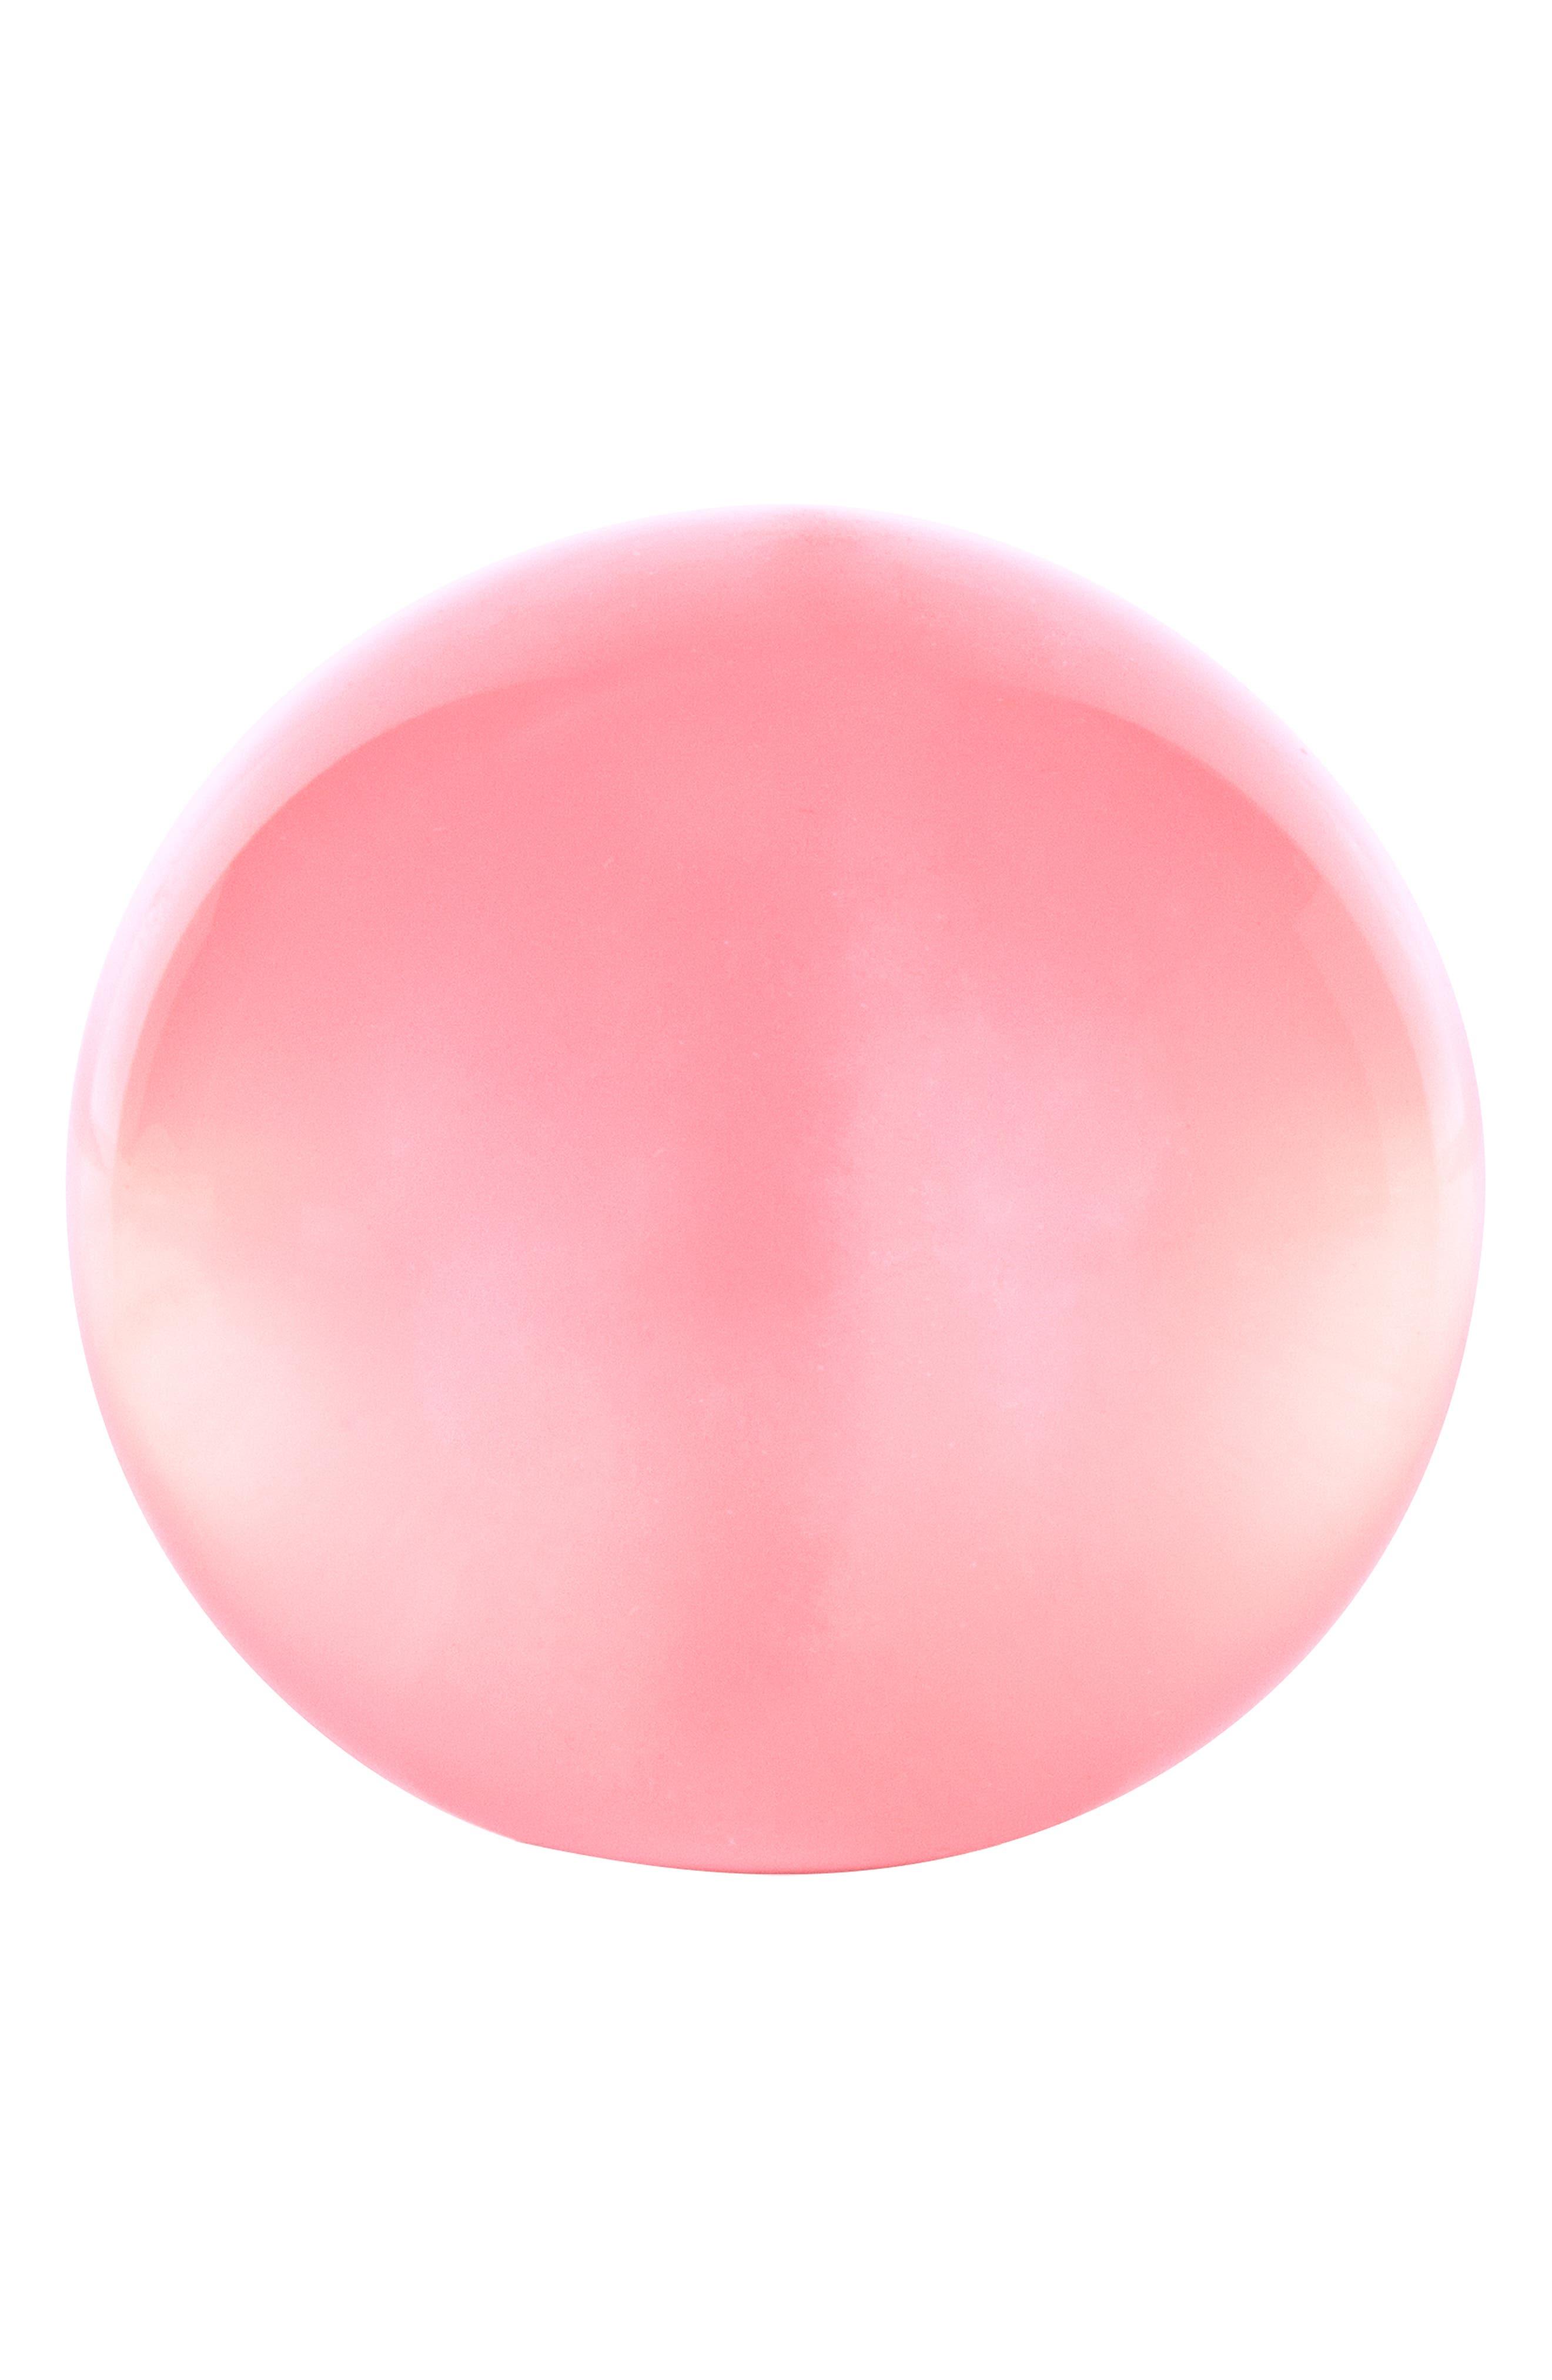 Tsubaki Jelly Ball Cleanser,                             Alternate thumbnail 2, color,                             NO COLOR